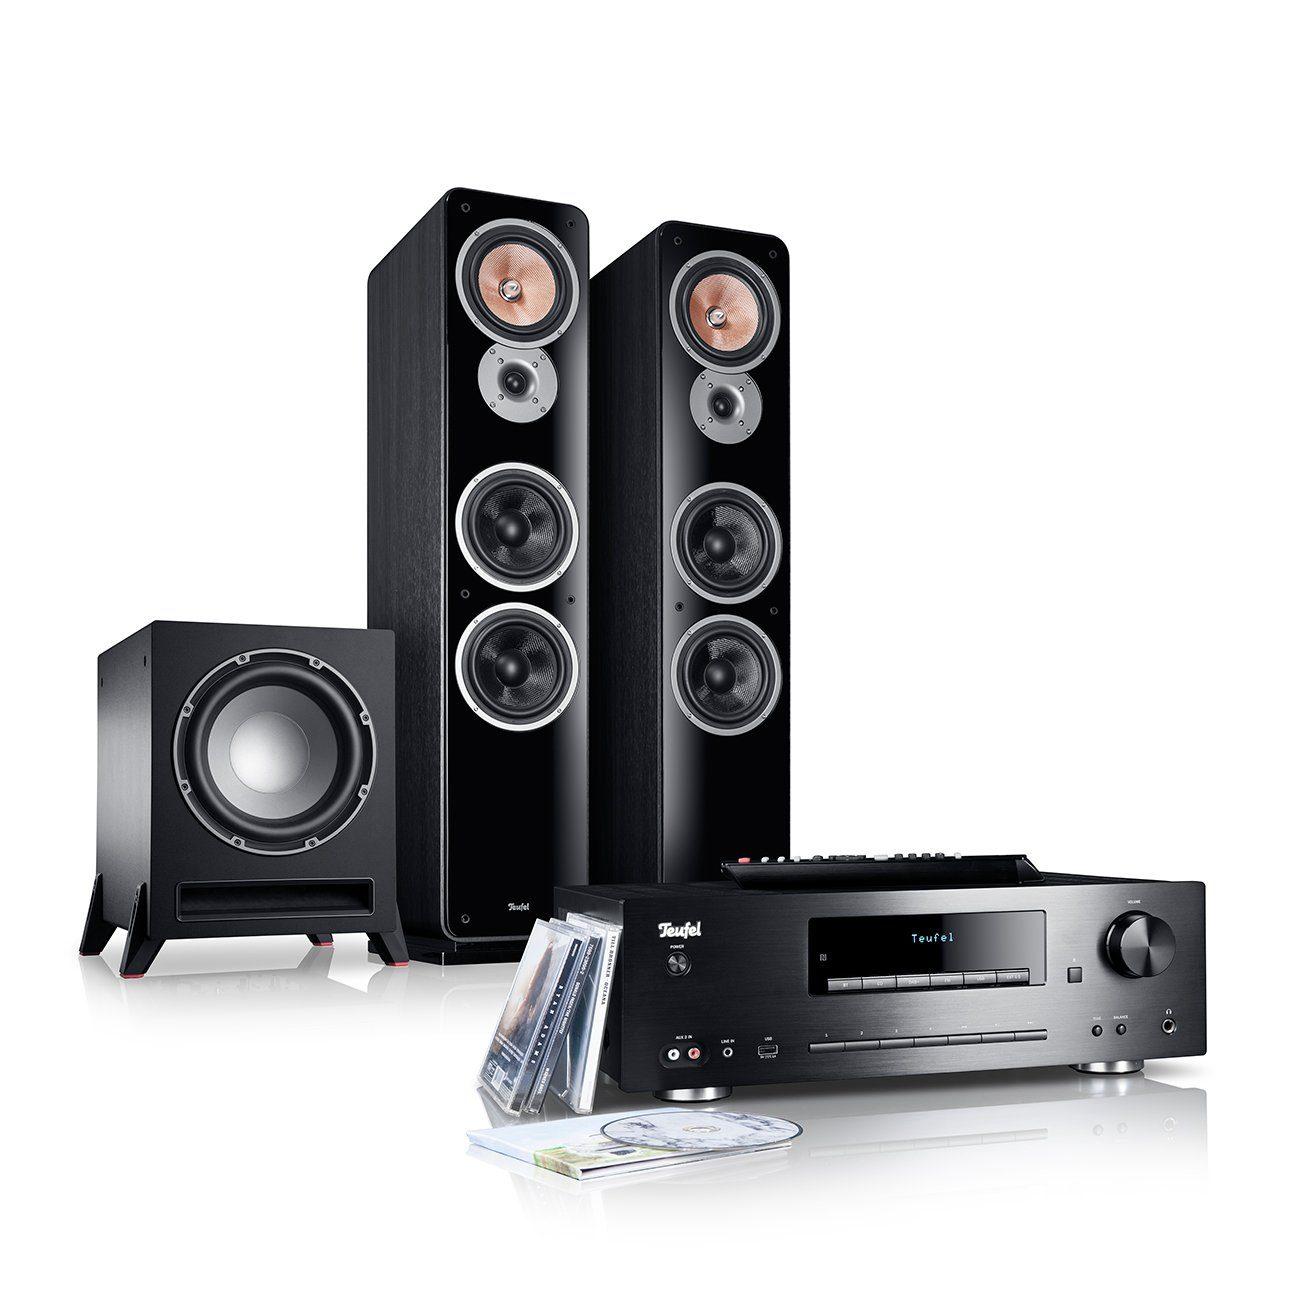 Teufel Stereo Lautsprecher »Kombo 62 Power Edition (2017)«